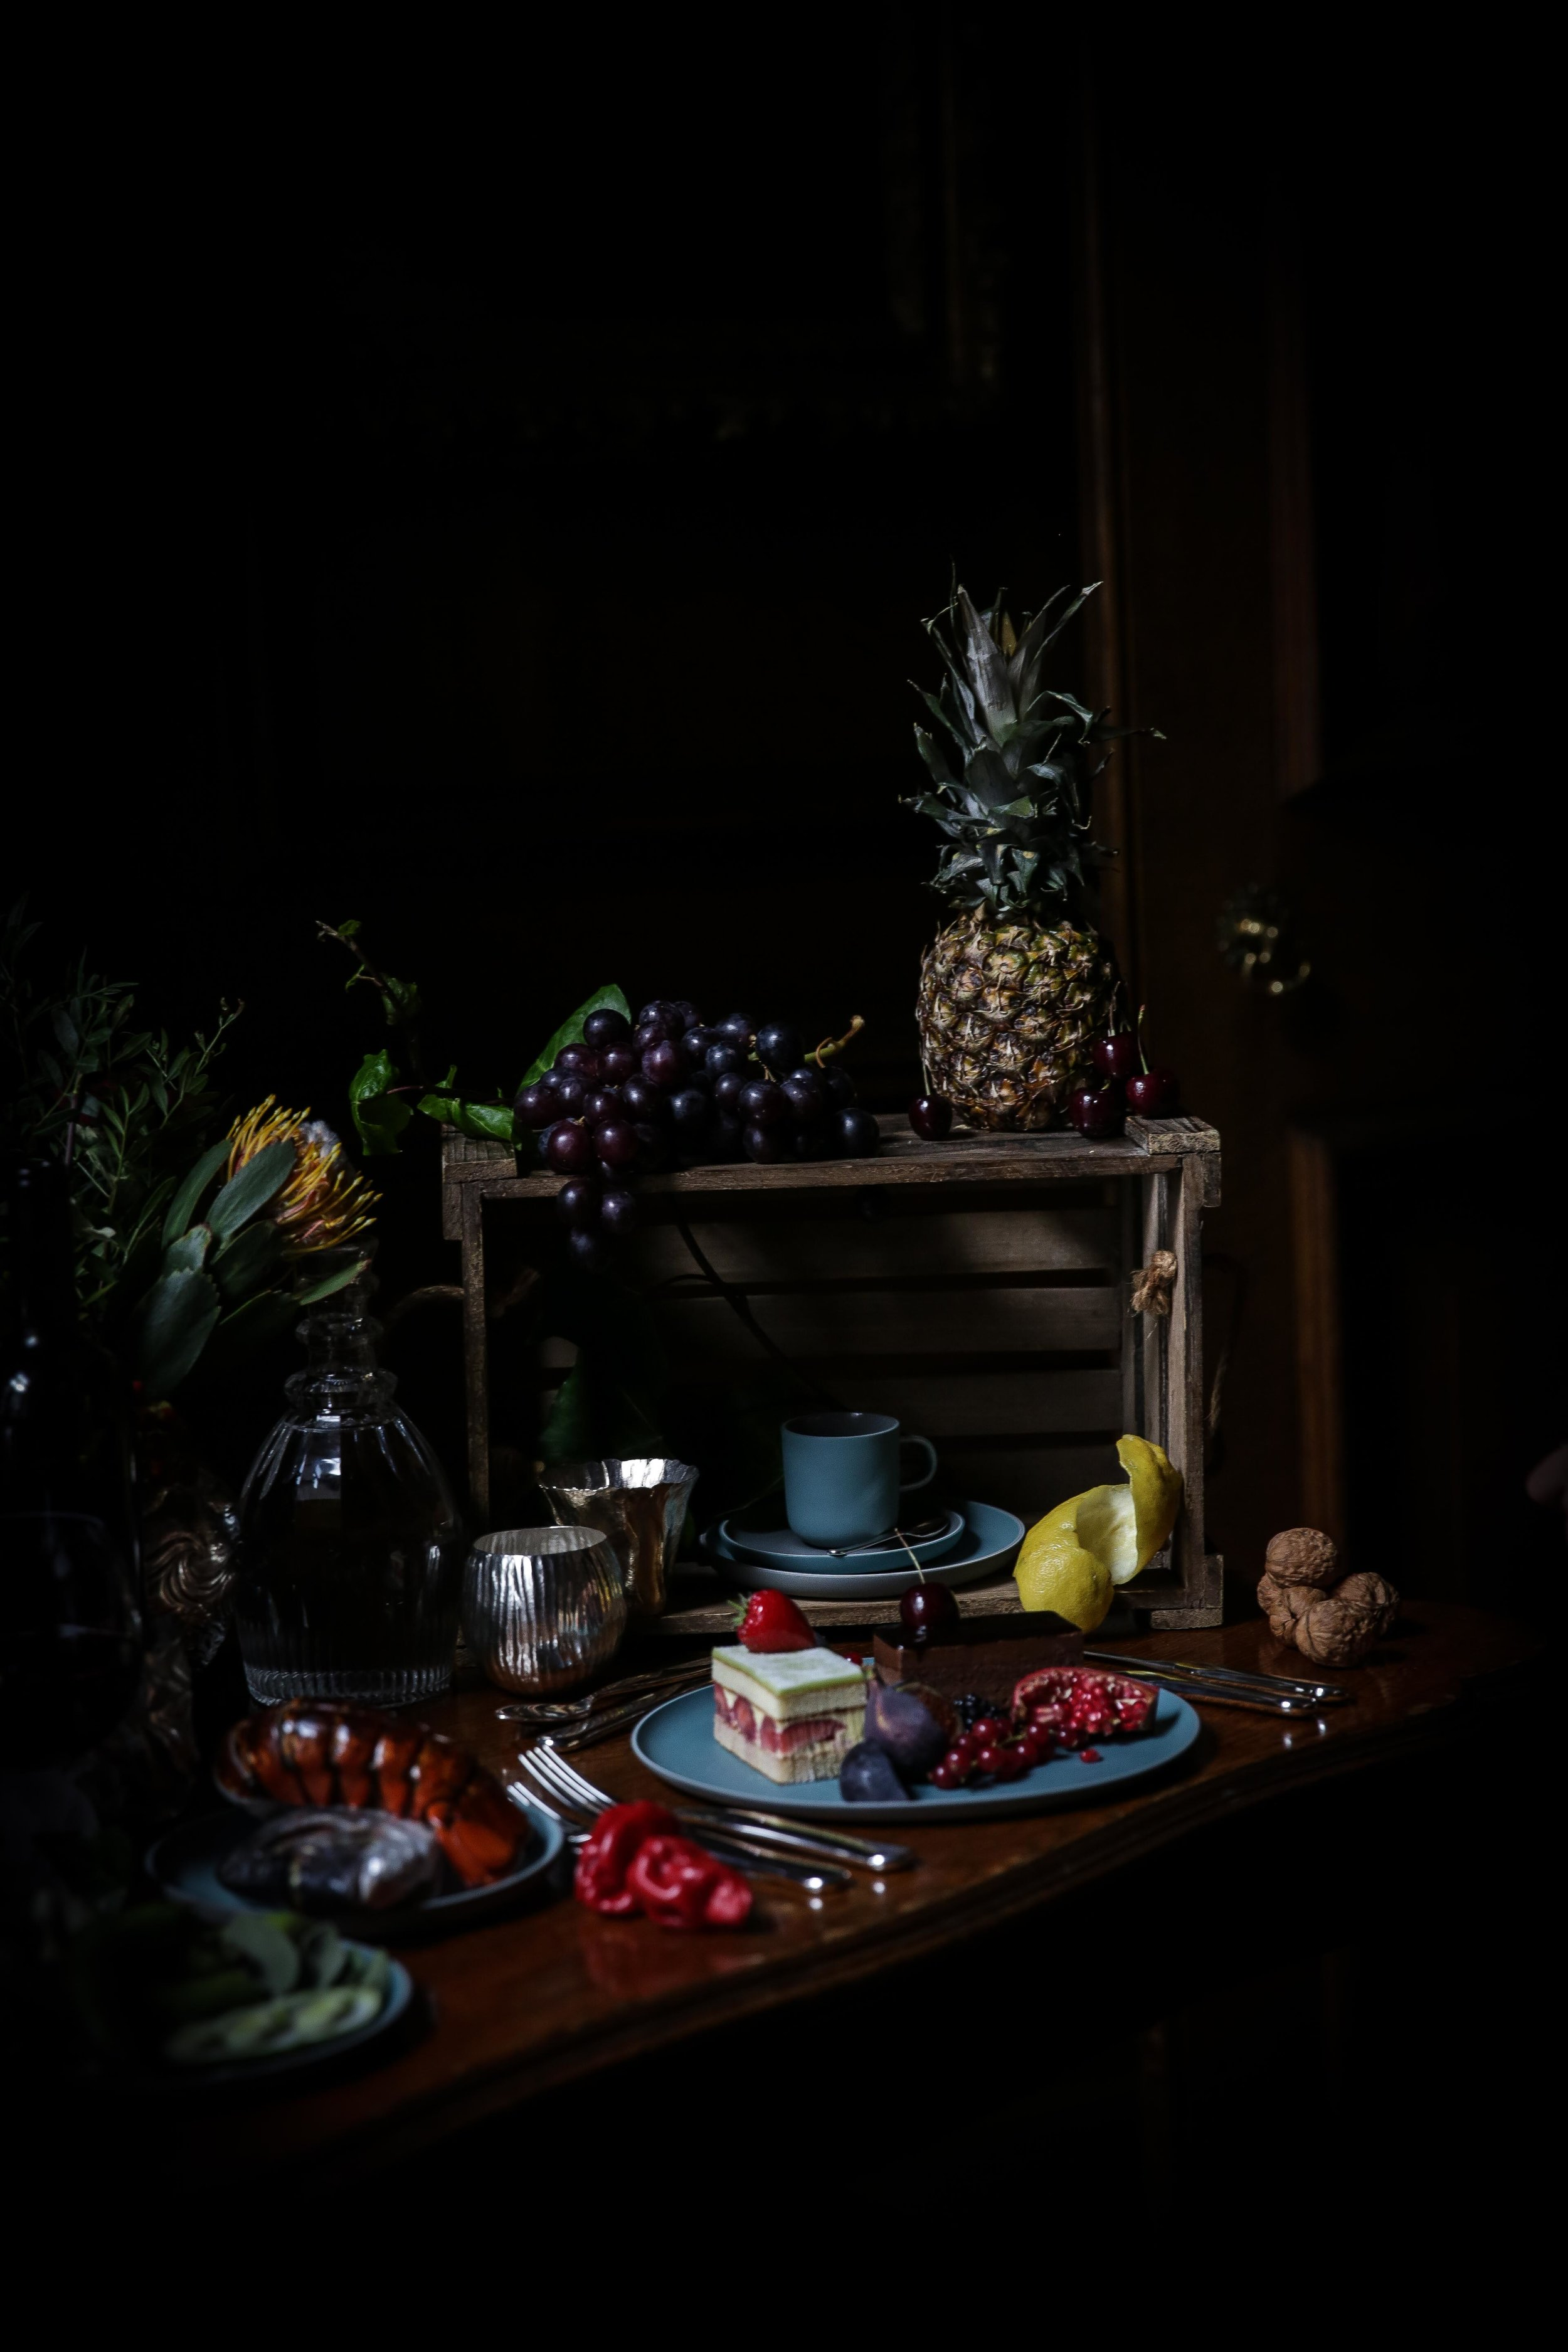 The Silverware Still Lives , 2017 |Photo - Rosalind Atkinson, Art Direction - Tasha Marks